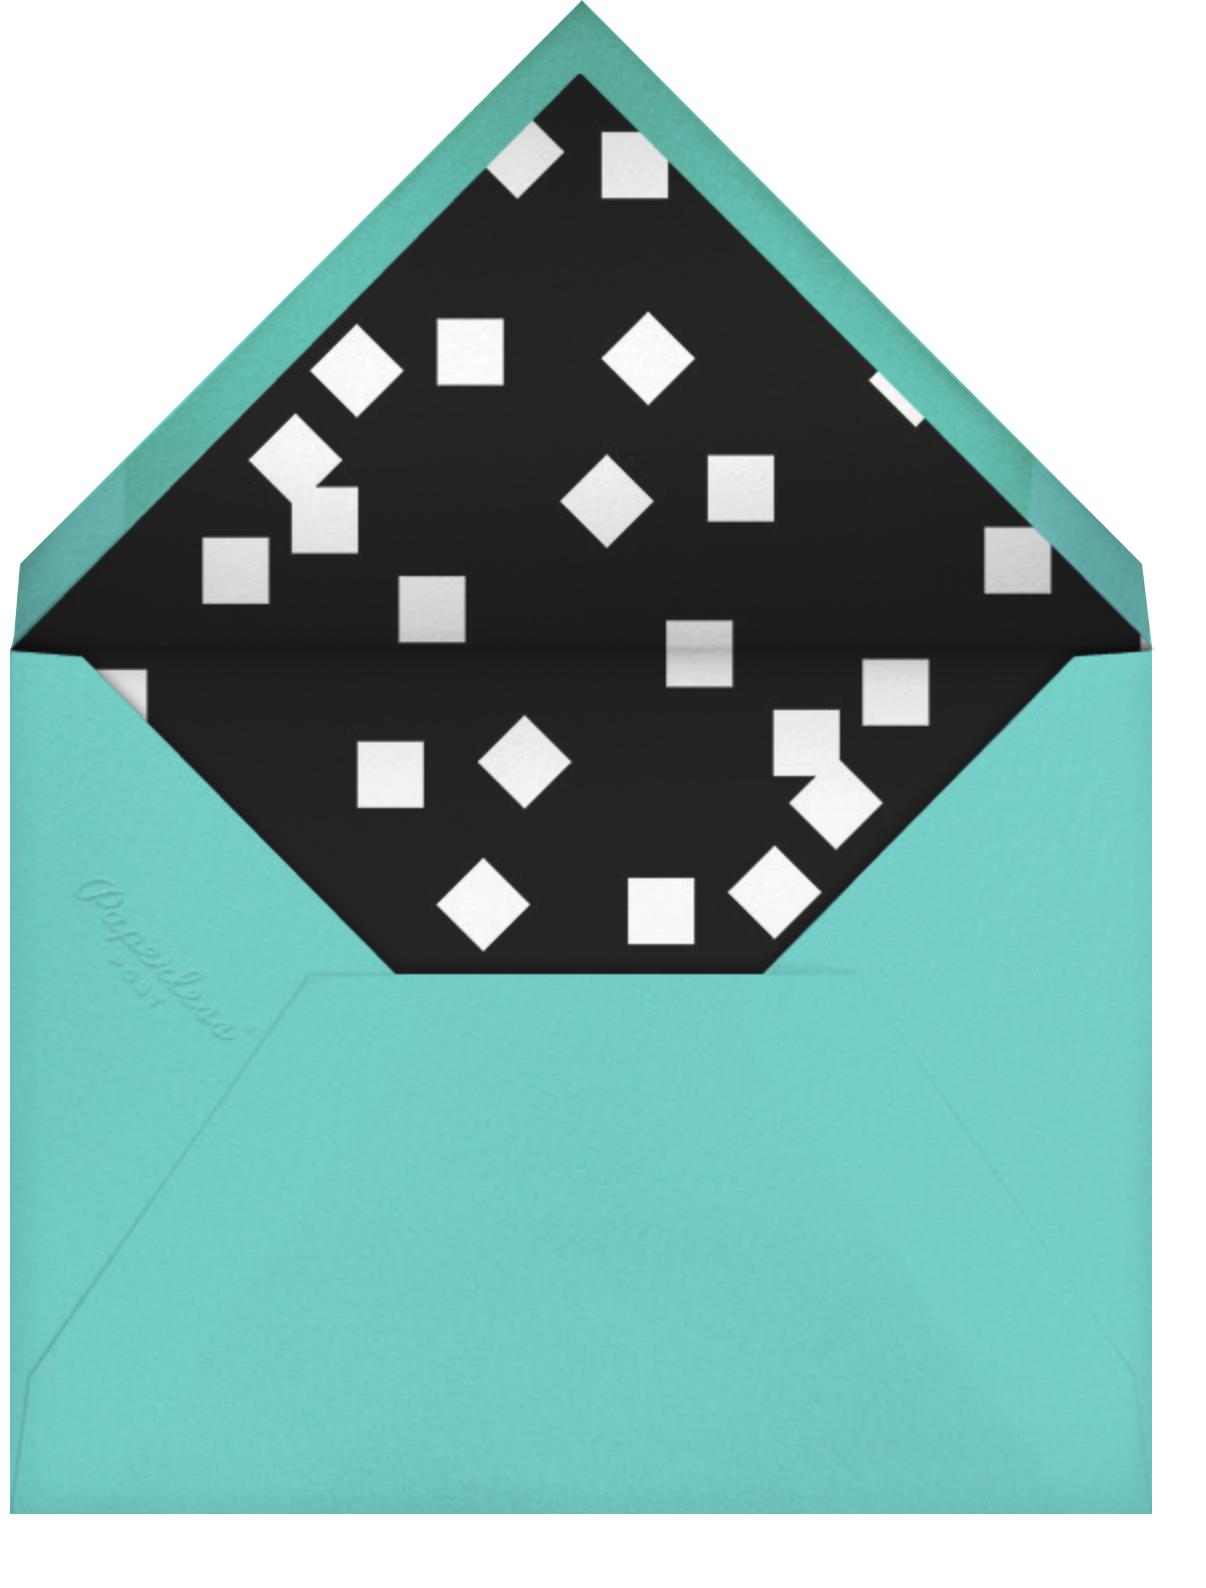 Painted Circle (Invitation) - White - Paperless Post - Virtual wedding - envelope back